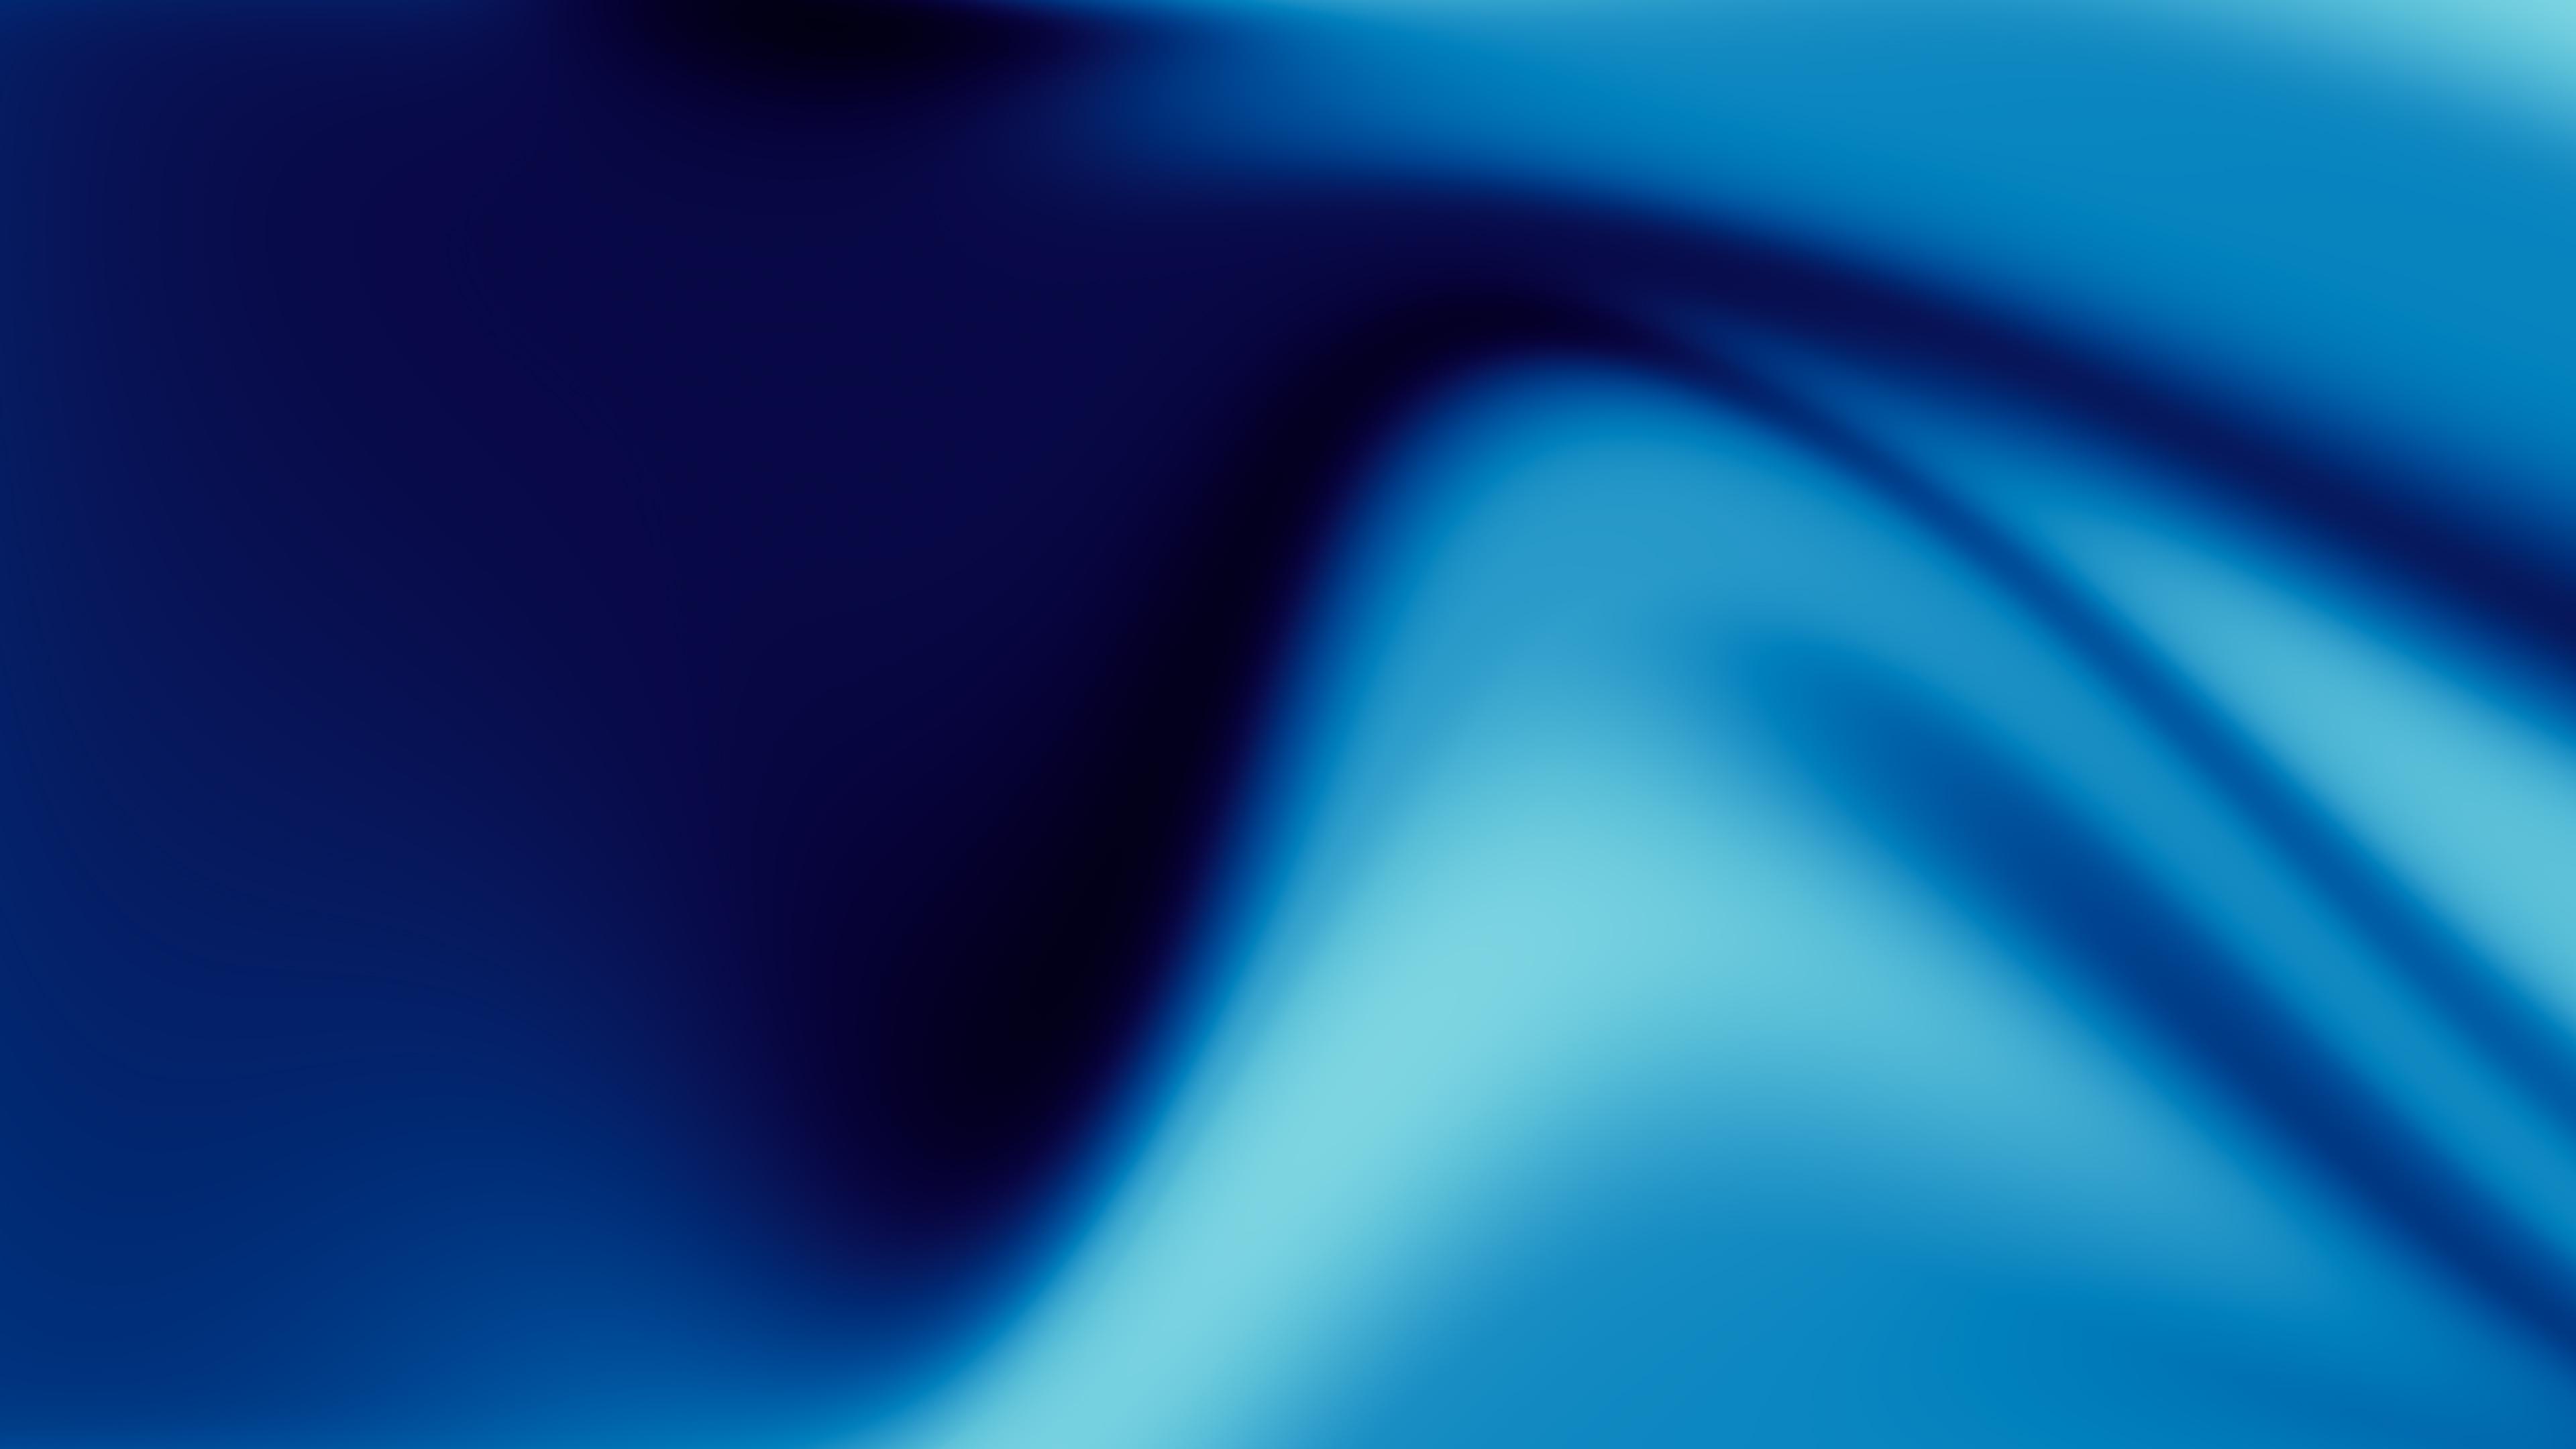 blue abstract gradient 1570394965 - Blue Abstract Gradient - hd-wallpapers, gradient wallpapers, digital art wallpapers, blue wallpapers, abstract wallpapers, 4k-wallpapers